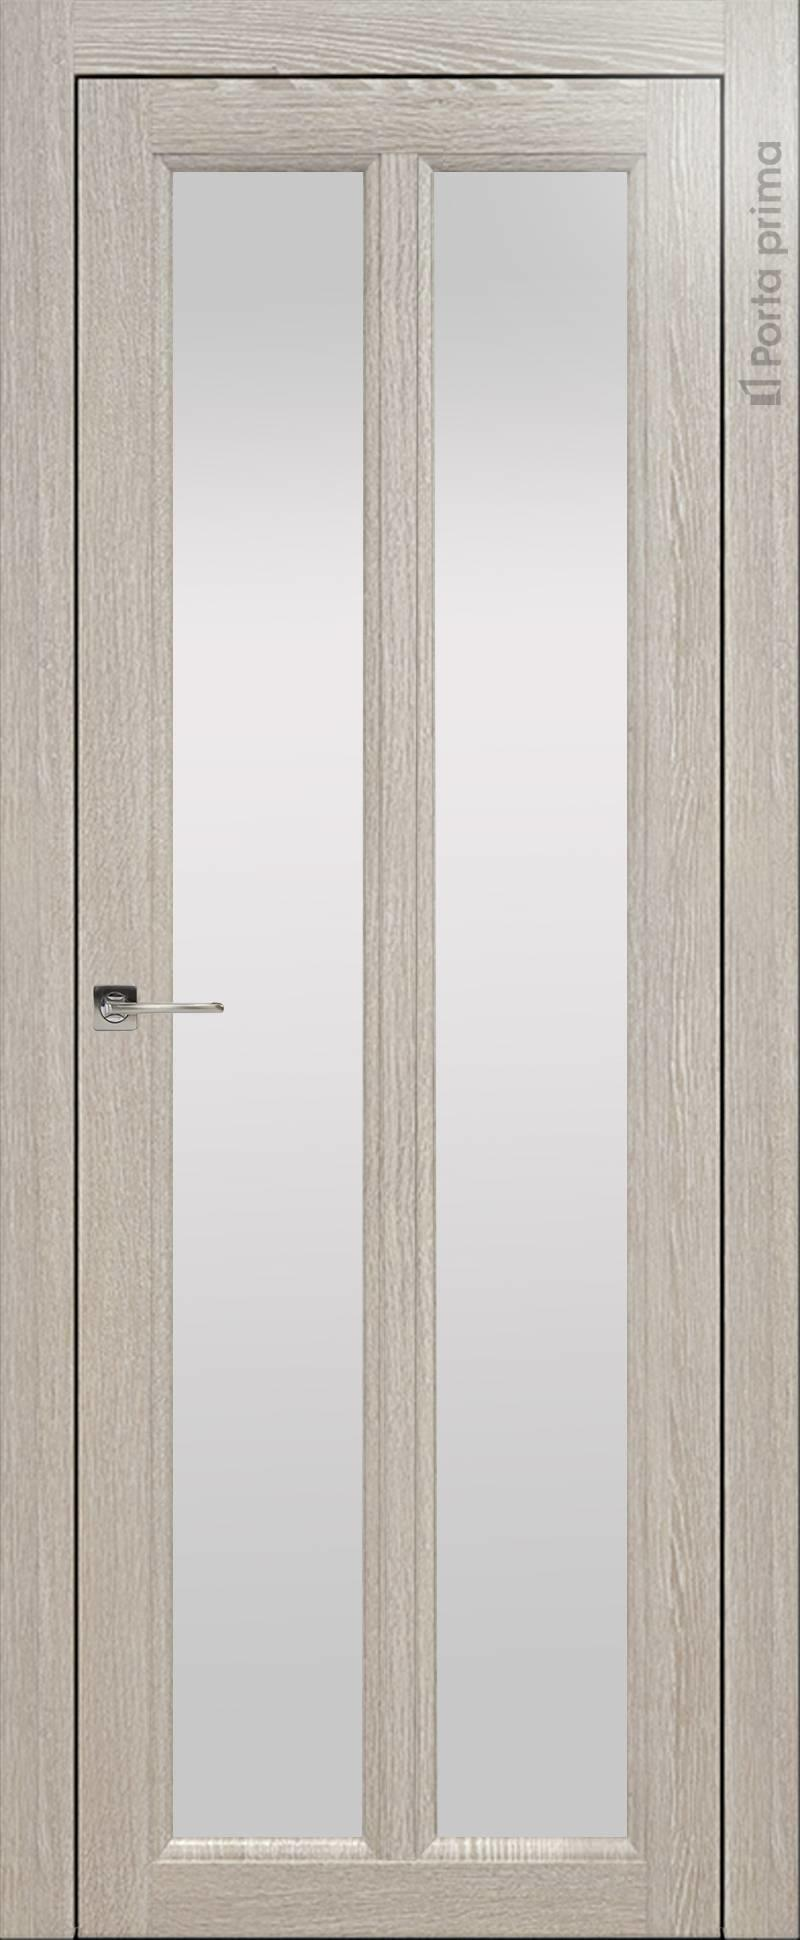 Sorrento-R Д4 цвет - Серый дуб Со стеклом (ДО)